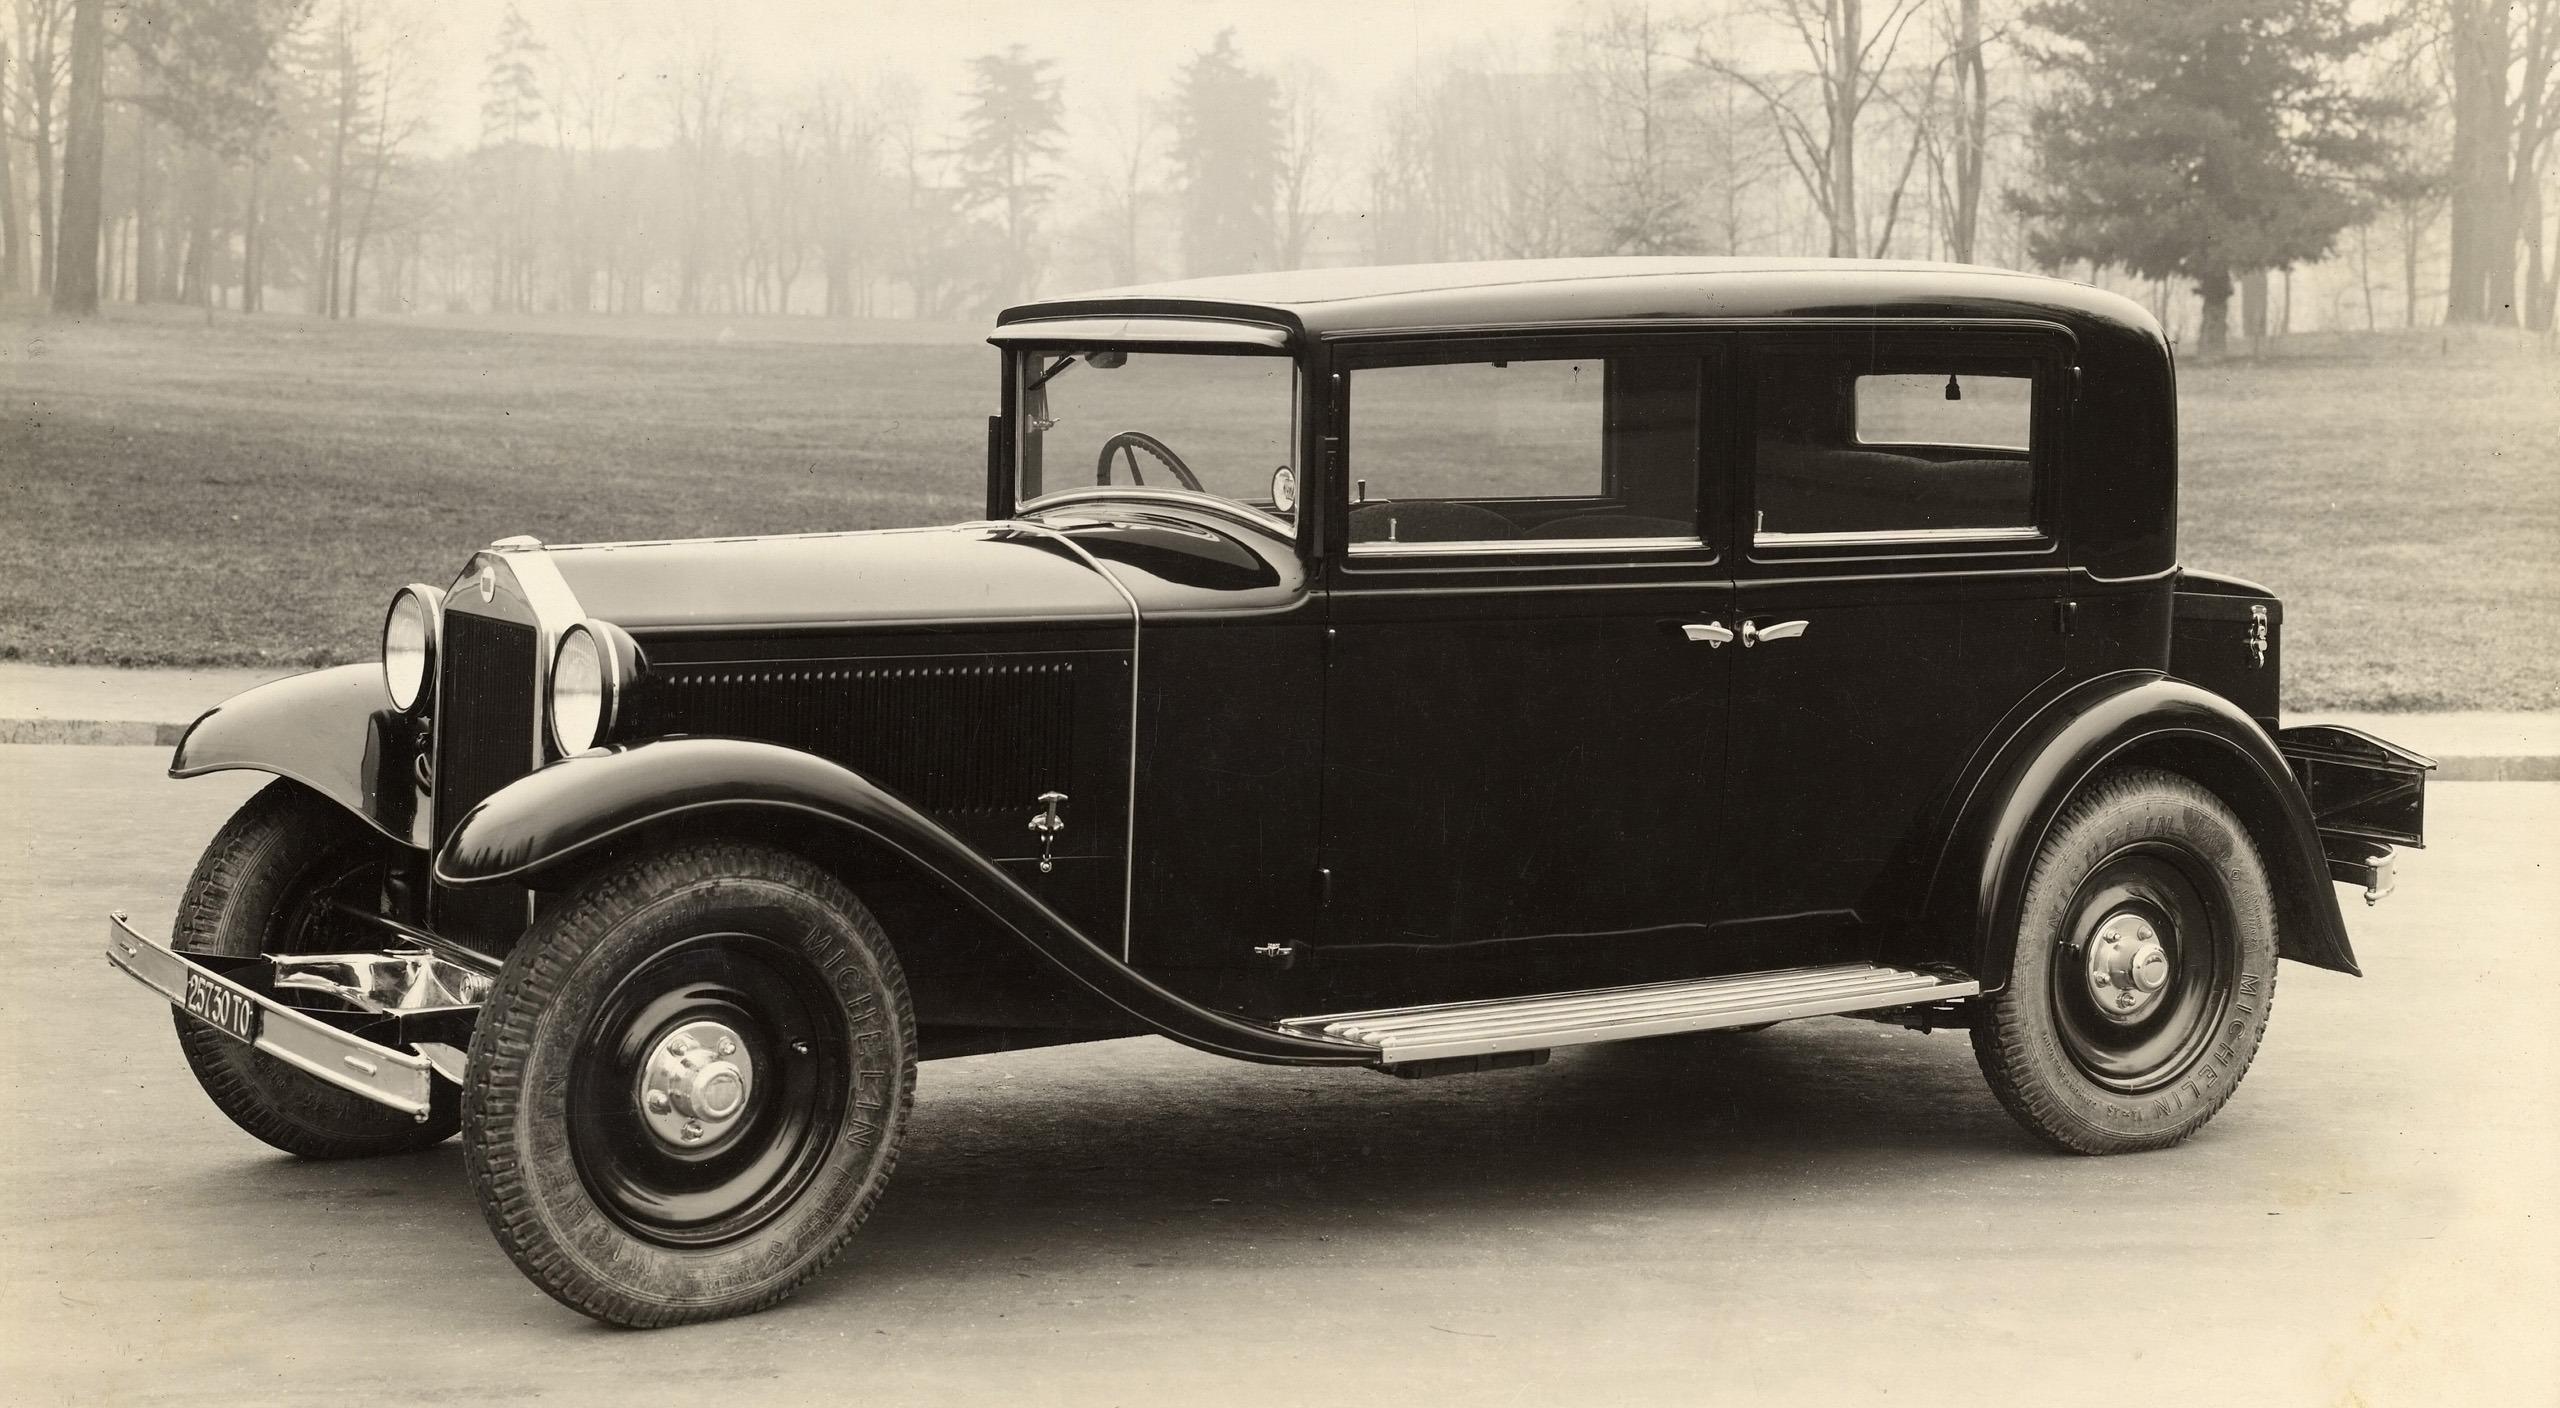 Bertone-100-Years-1930s-1932-Lancia-Artena-2560x1600